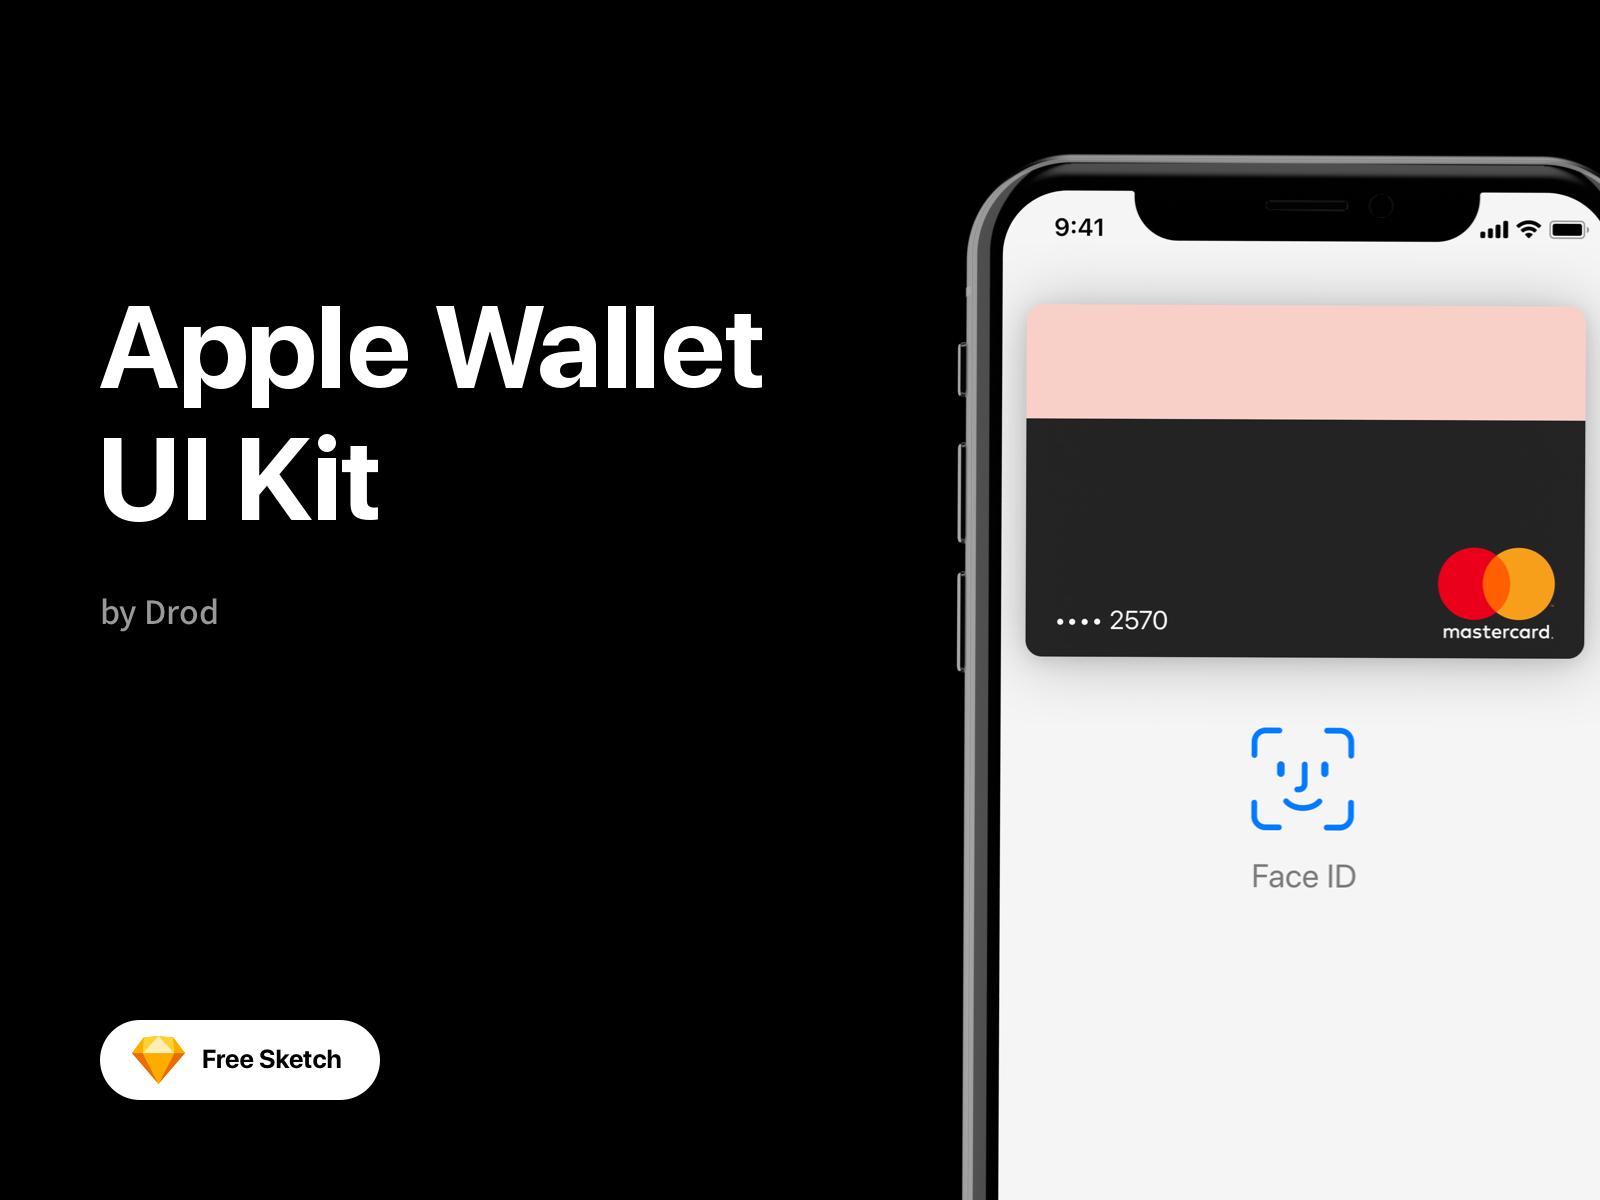 Apple Wallet Free UI Kit